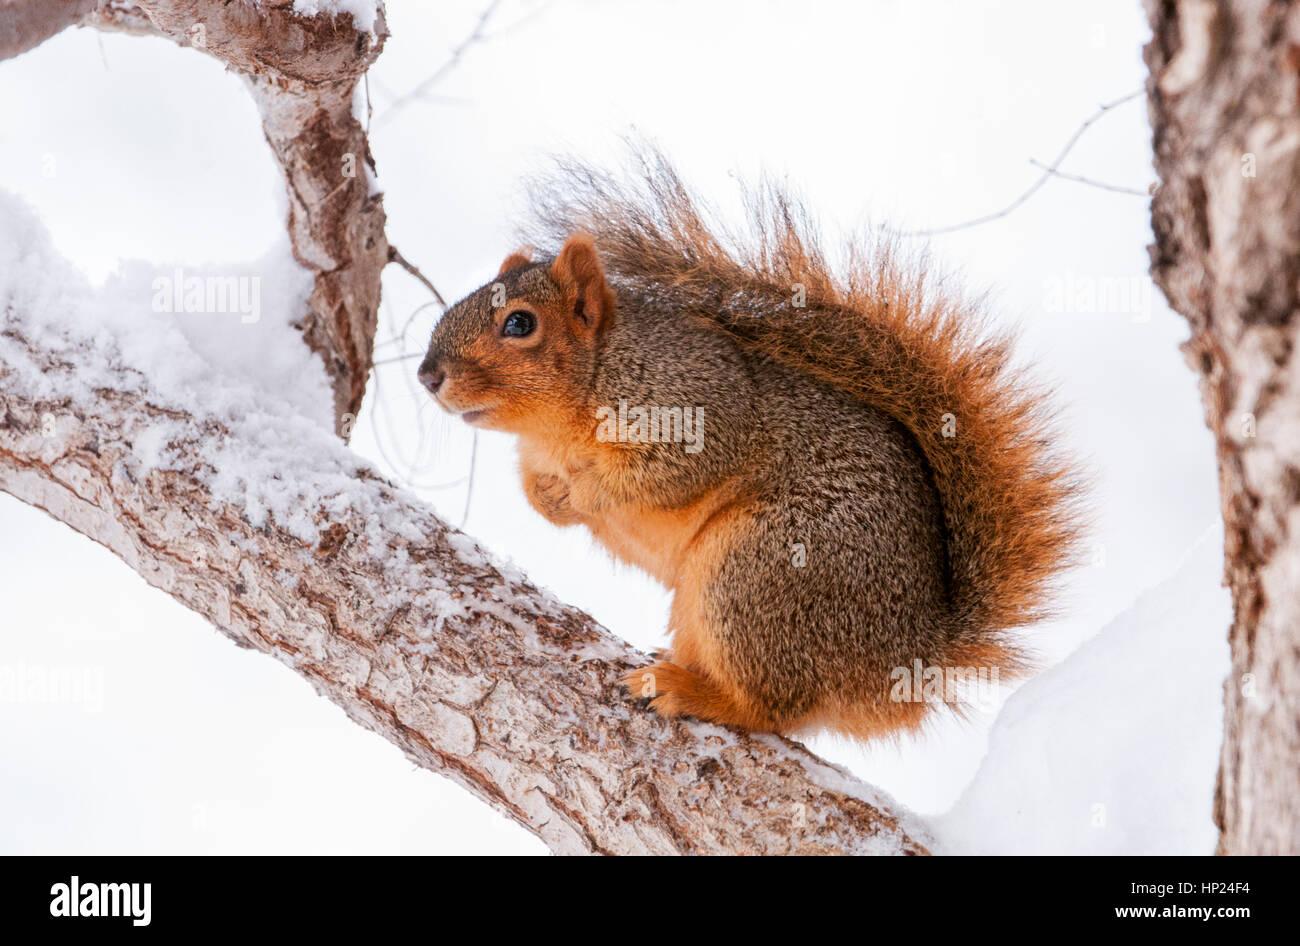 Eastern Fox Squirrel Idaho Stock Photo 134042472 Alamy